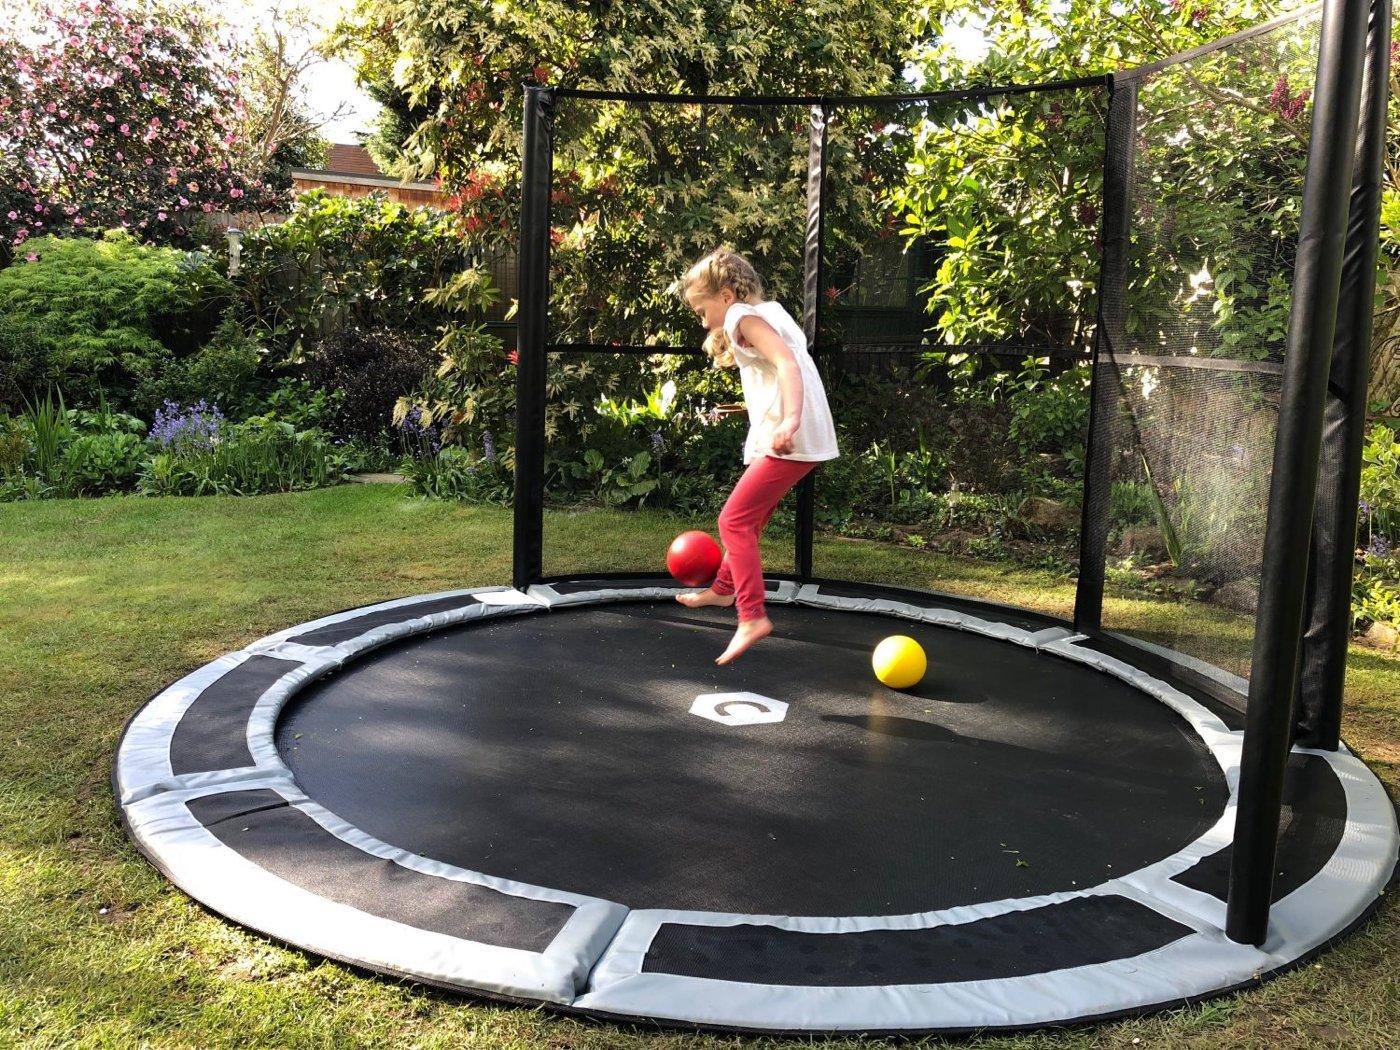 Trampolin bodengleich Fußballtor Garten